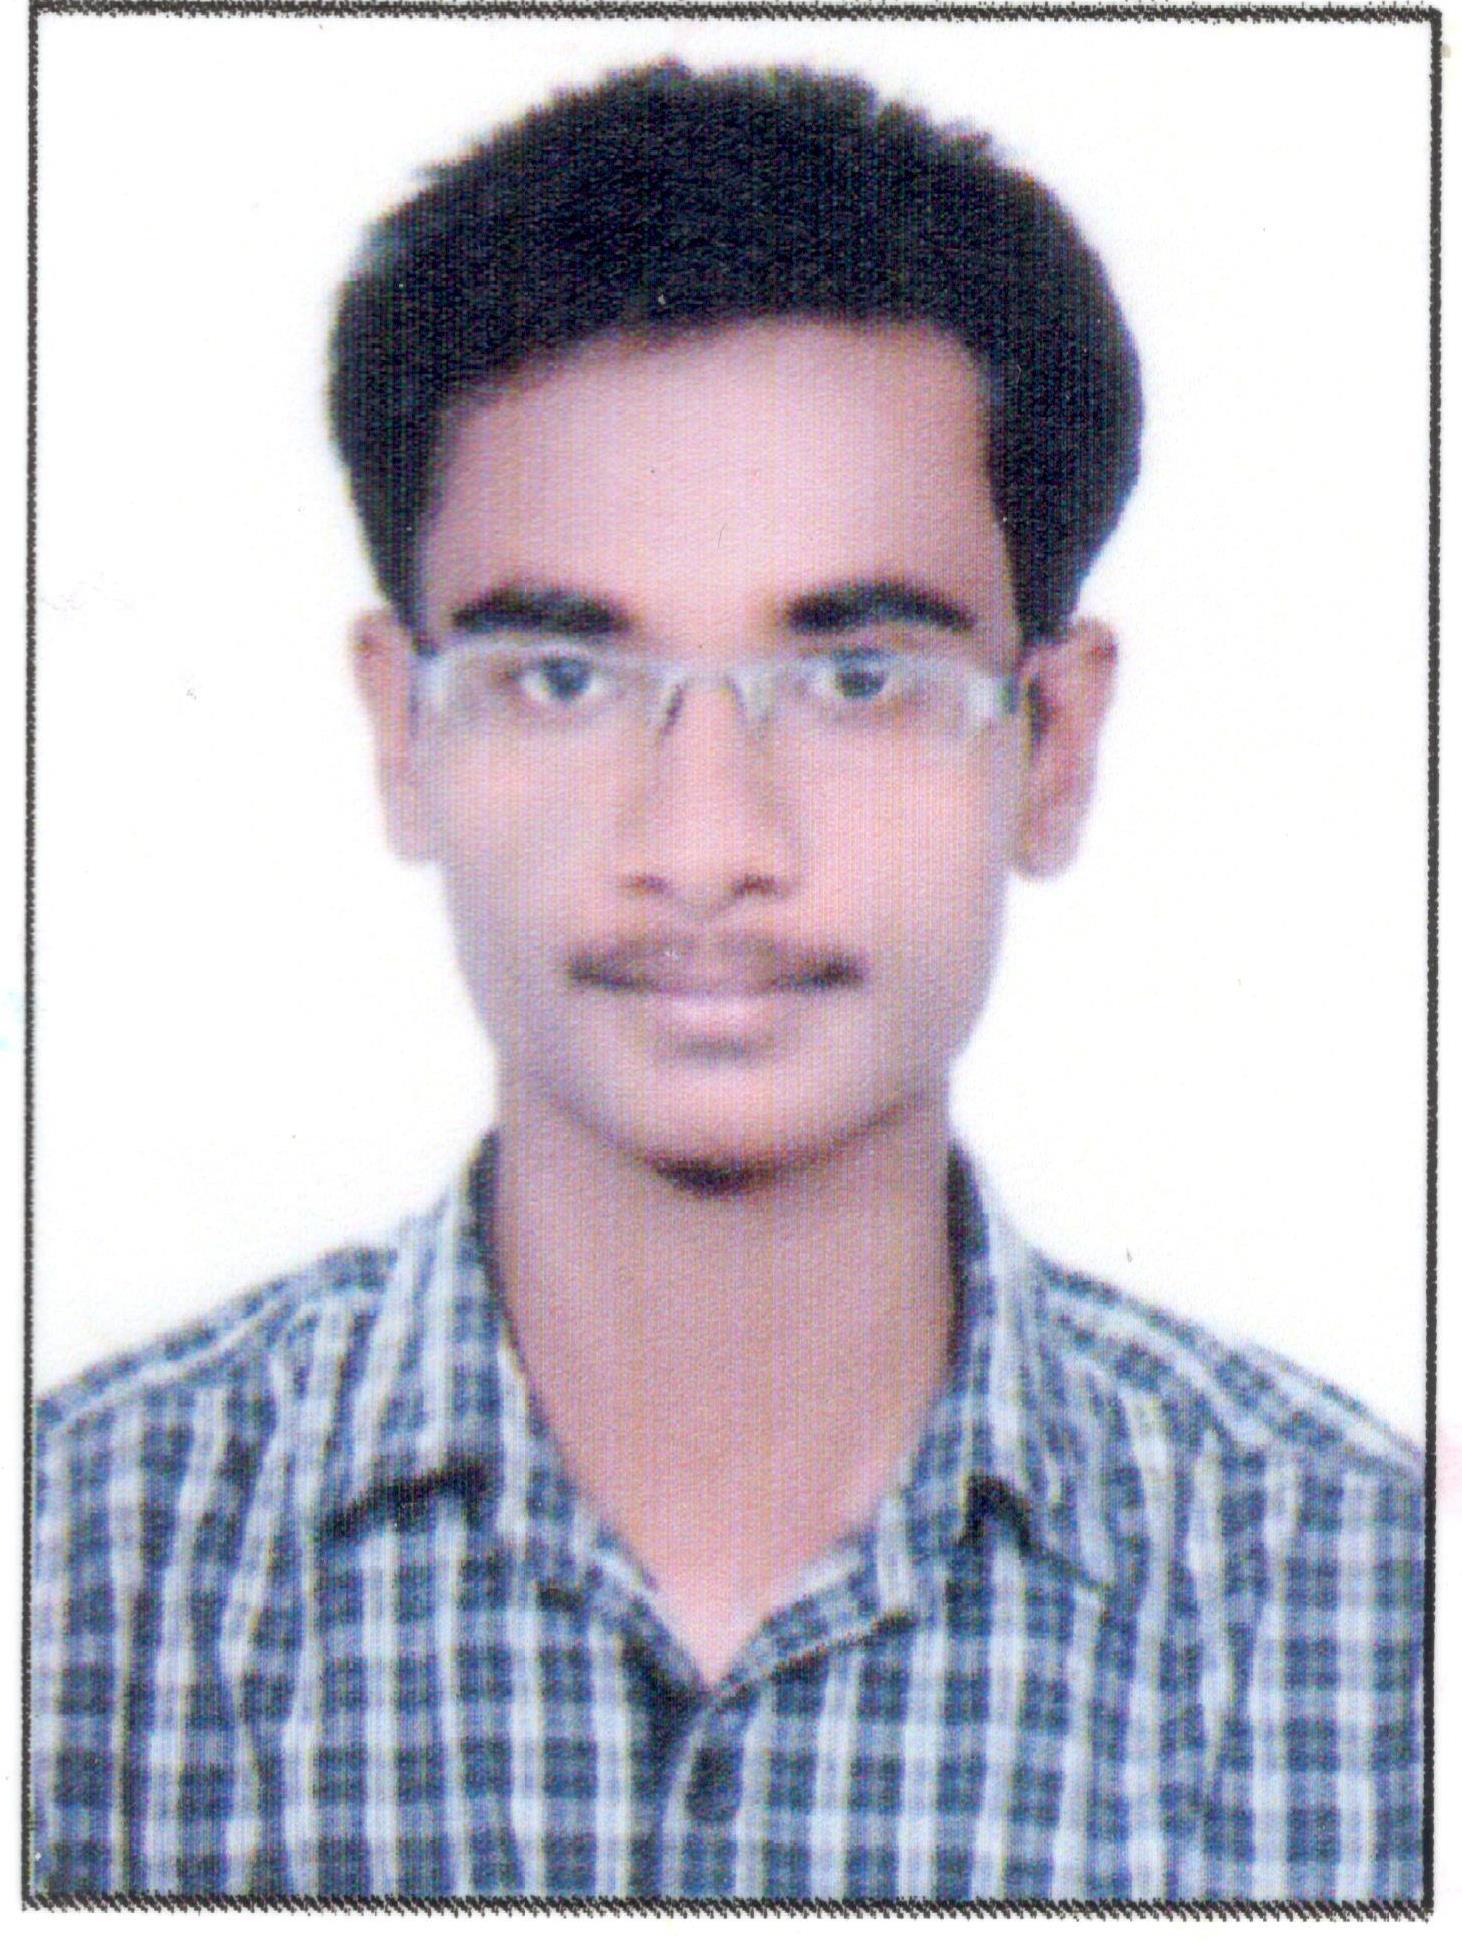 Aditya Kokare